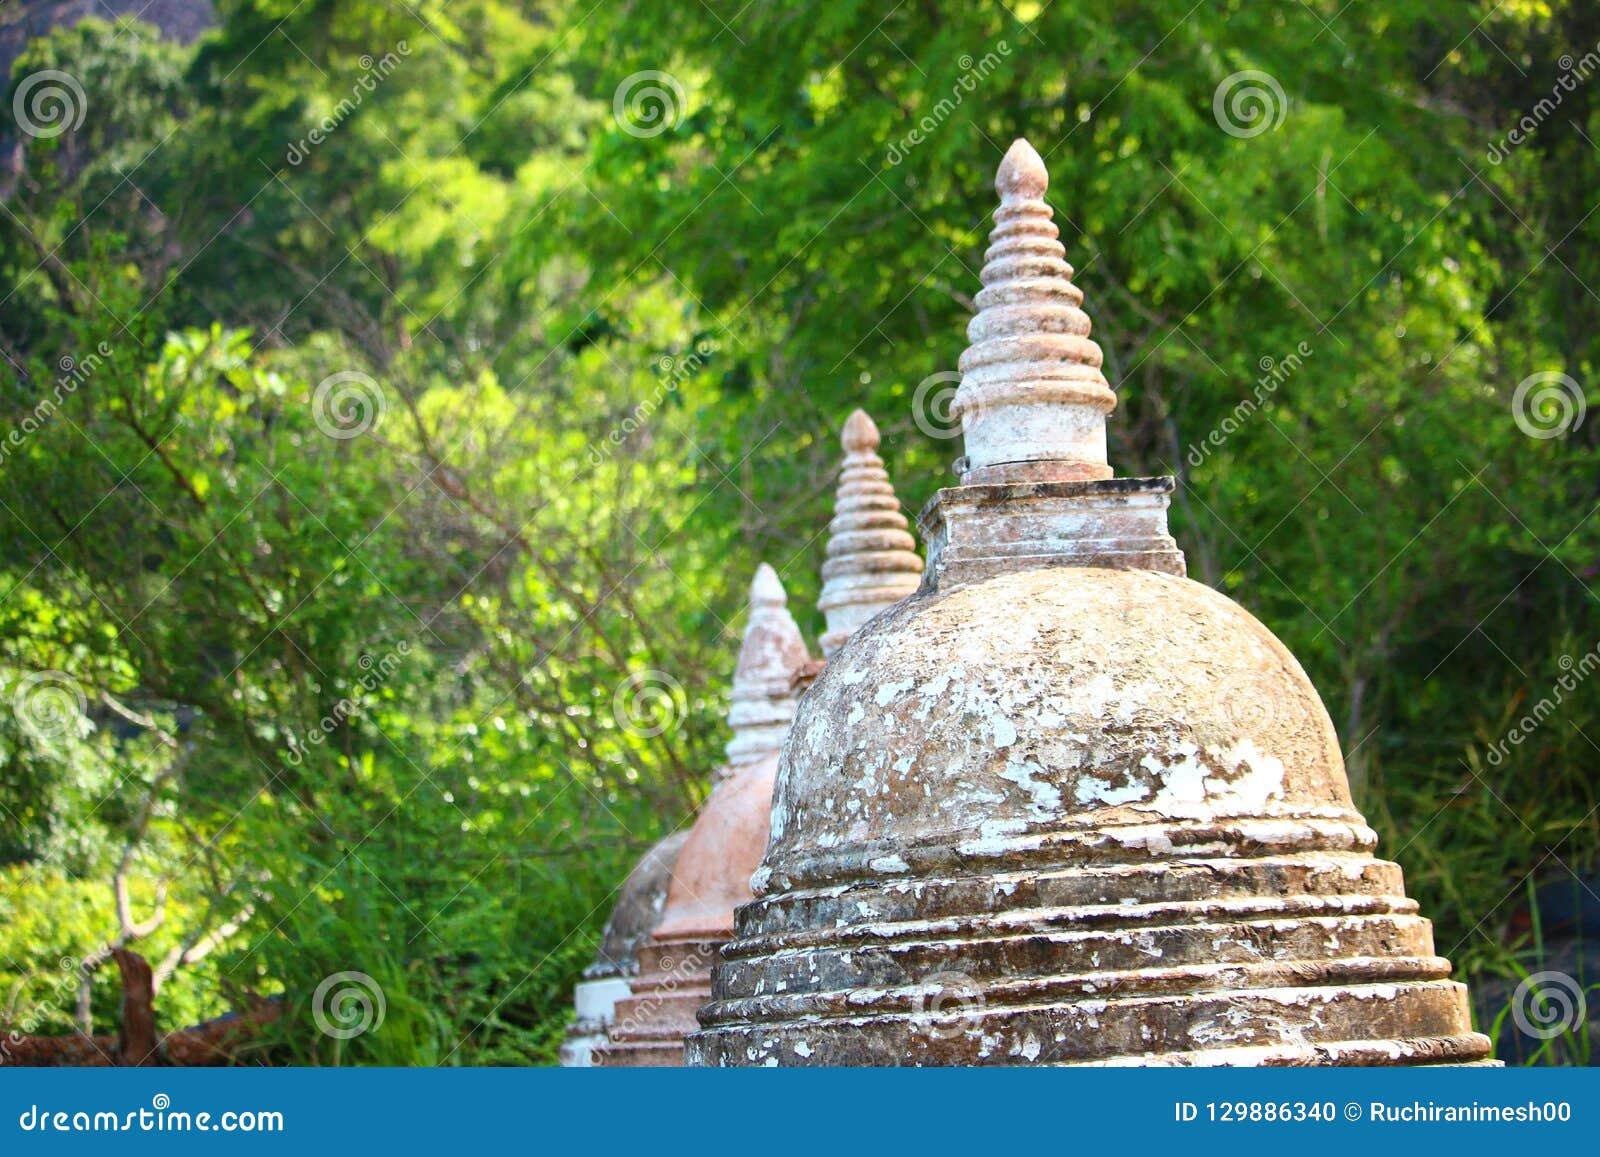 Nathural image of kurunegala aethugal wehera sri lanka